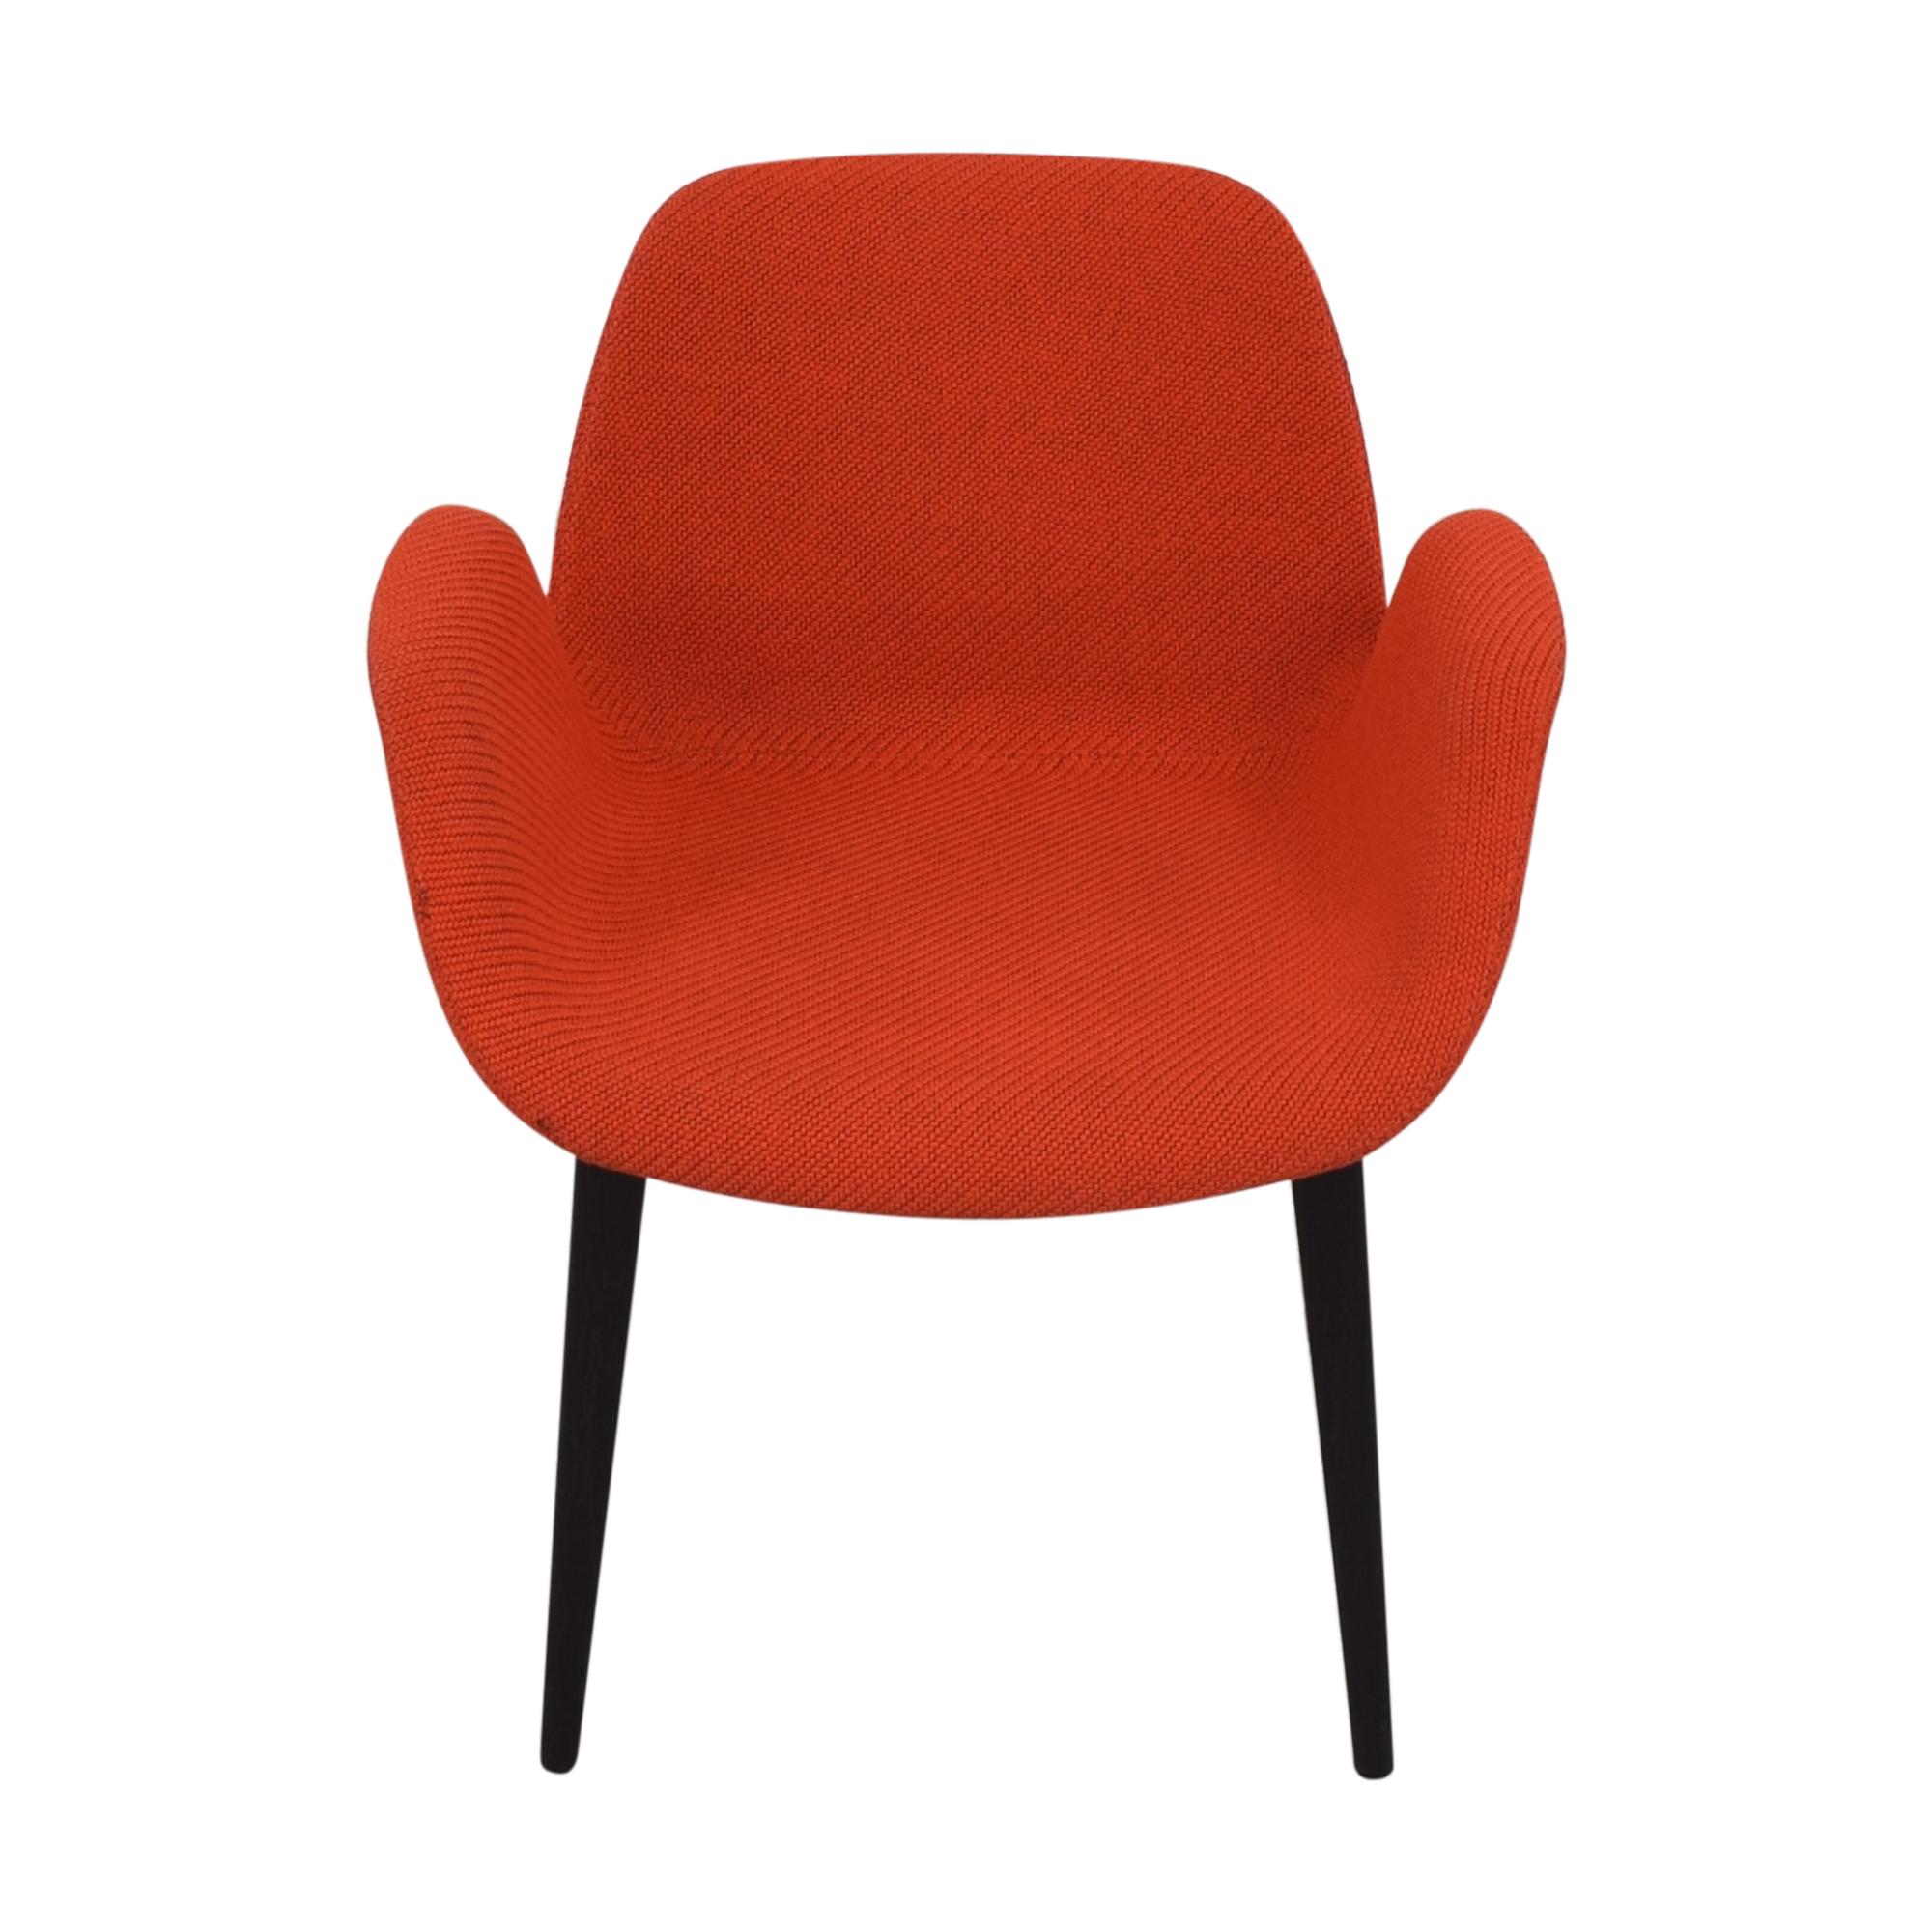 Koleksiyon Koleksiyon Halia Arm Chair discount